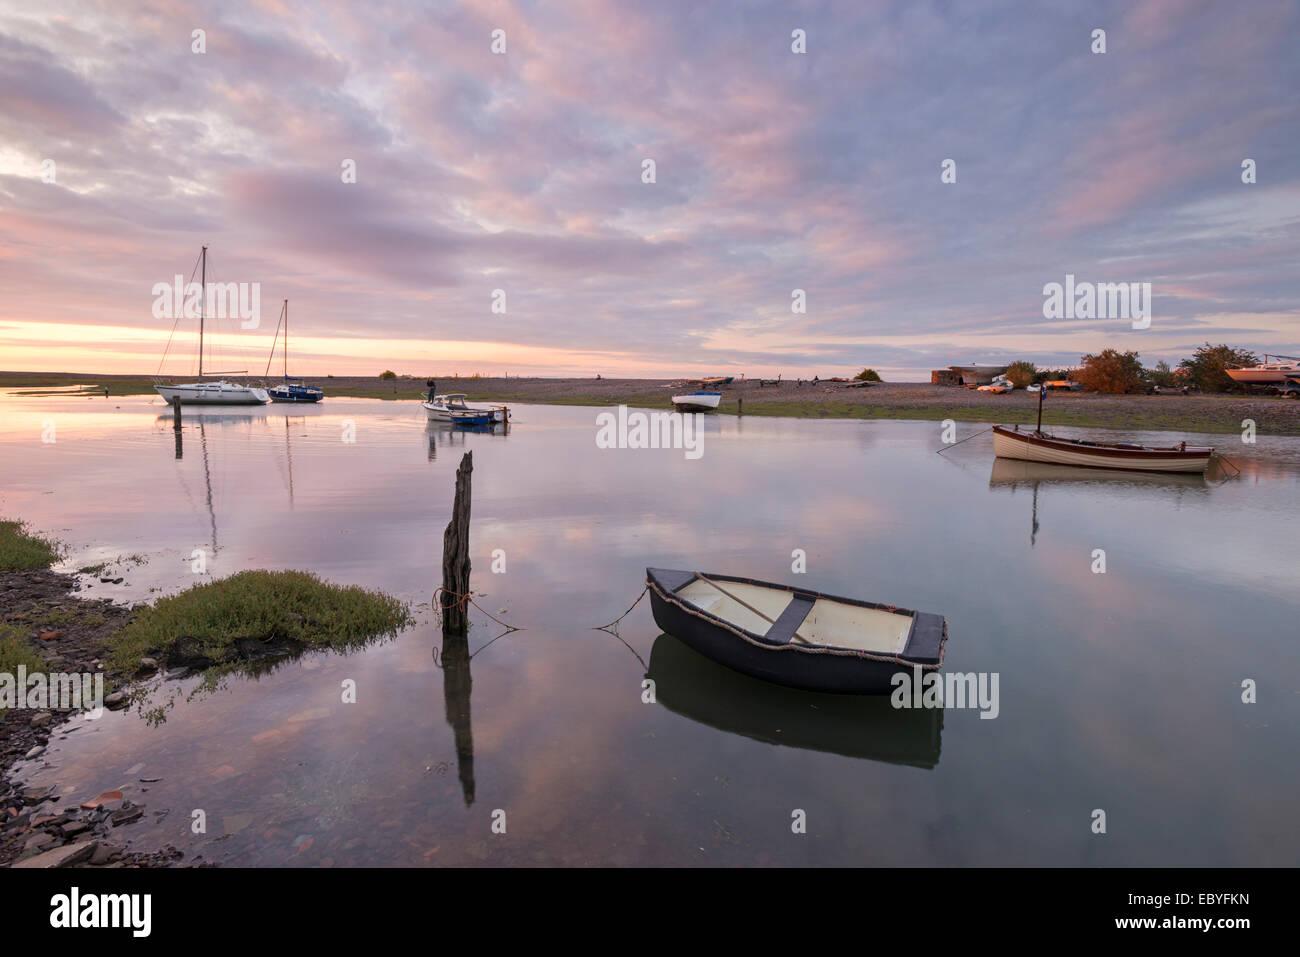 Sunset over Porlock Weir harbour, Exmoor, Somerset, England. Summer (July) 2014. Stock Photo